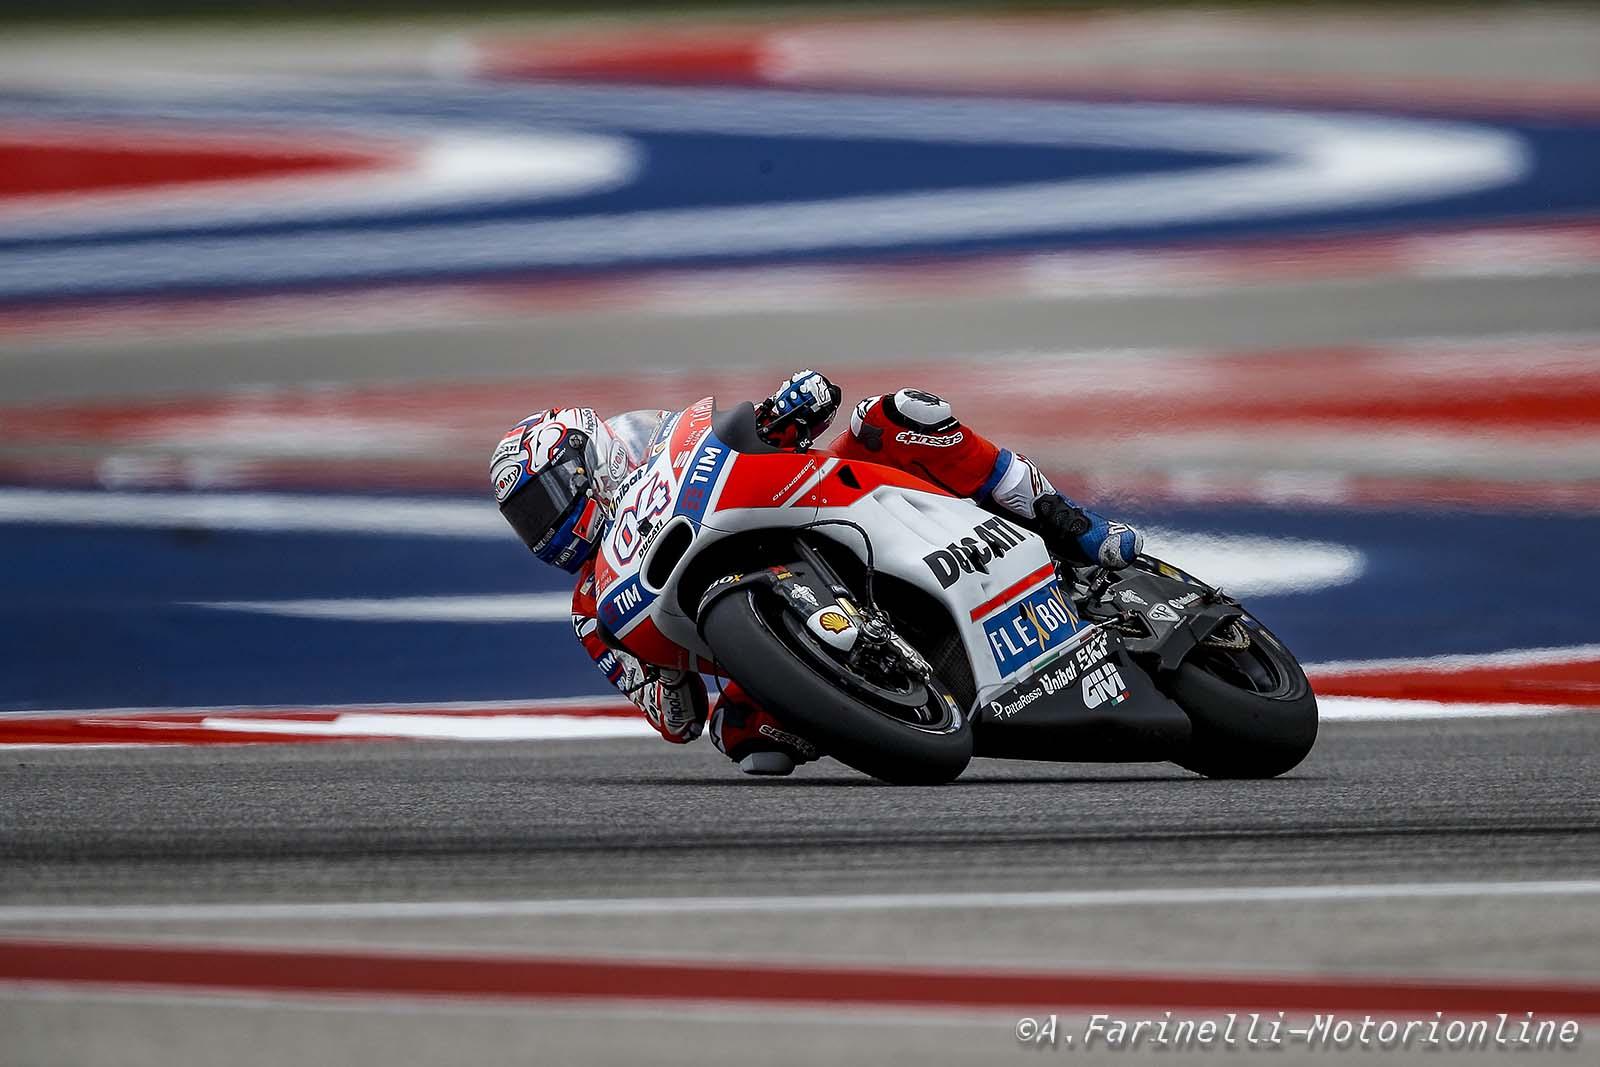 MotoGP Austin 2017Day_2 Foto MotoGP alta risoluzione 7 di 54